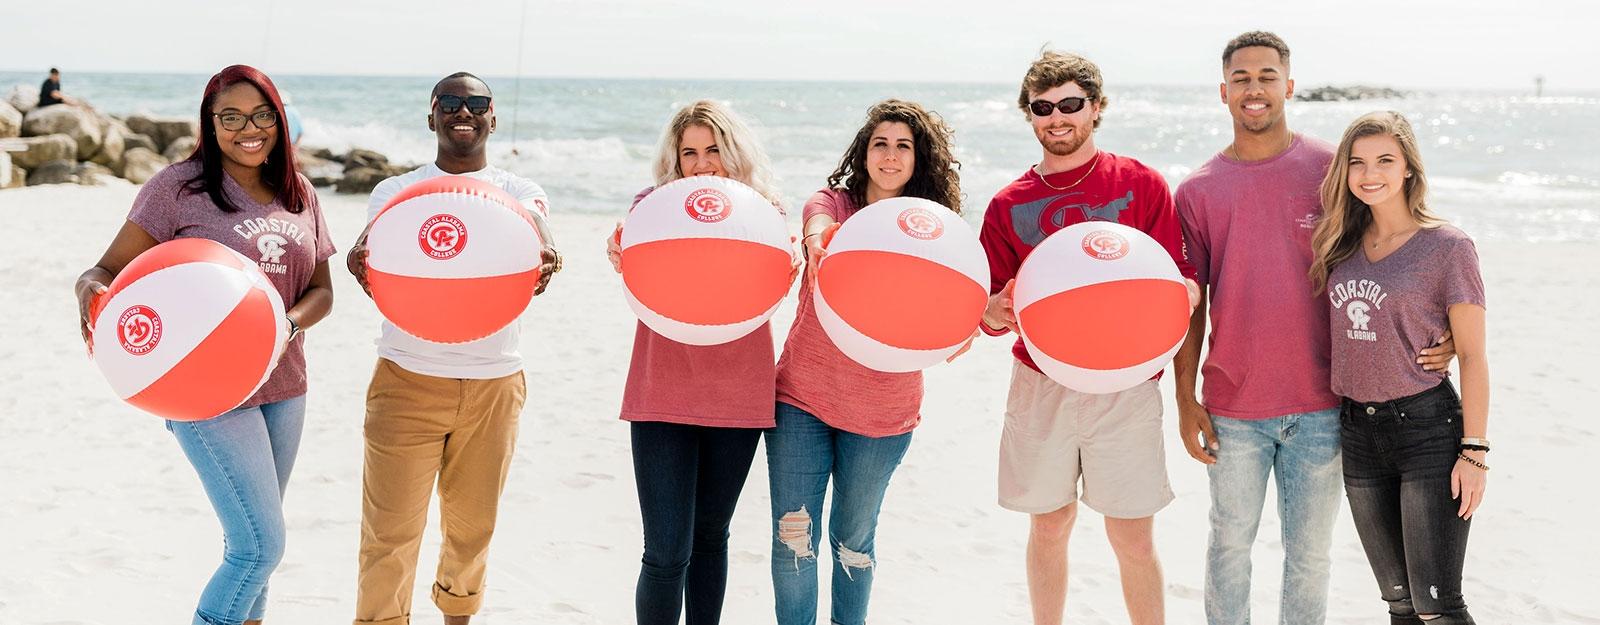 Students at beach holding Coastal beachballs